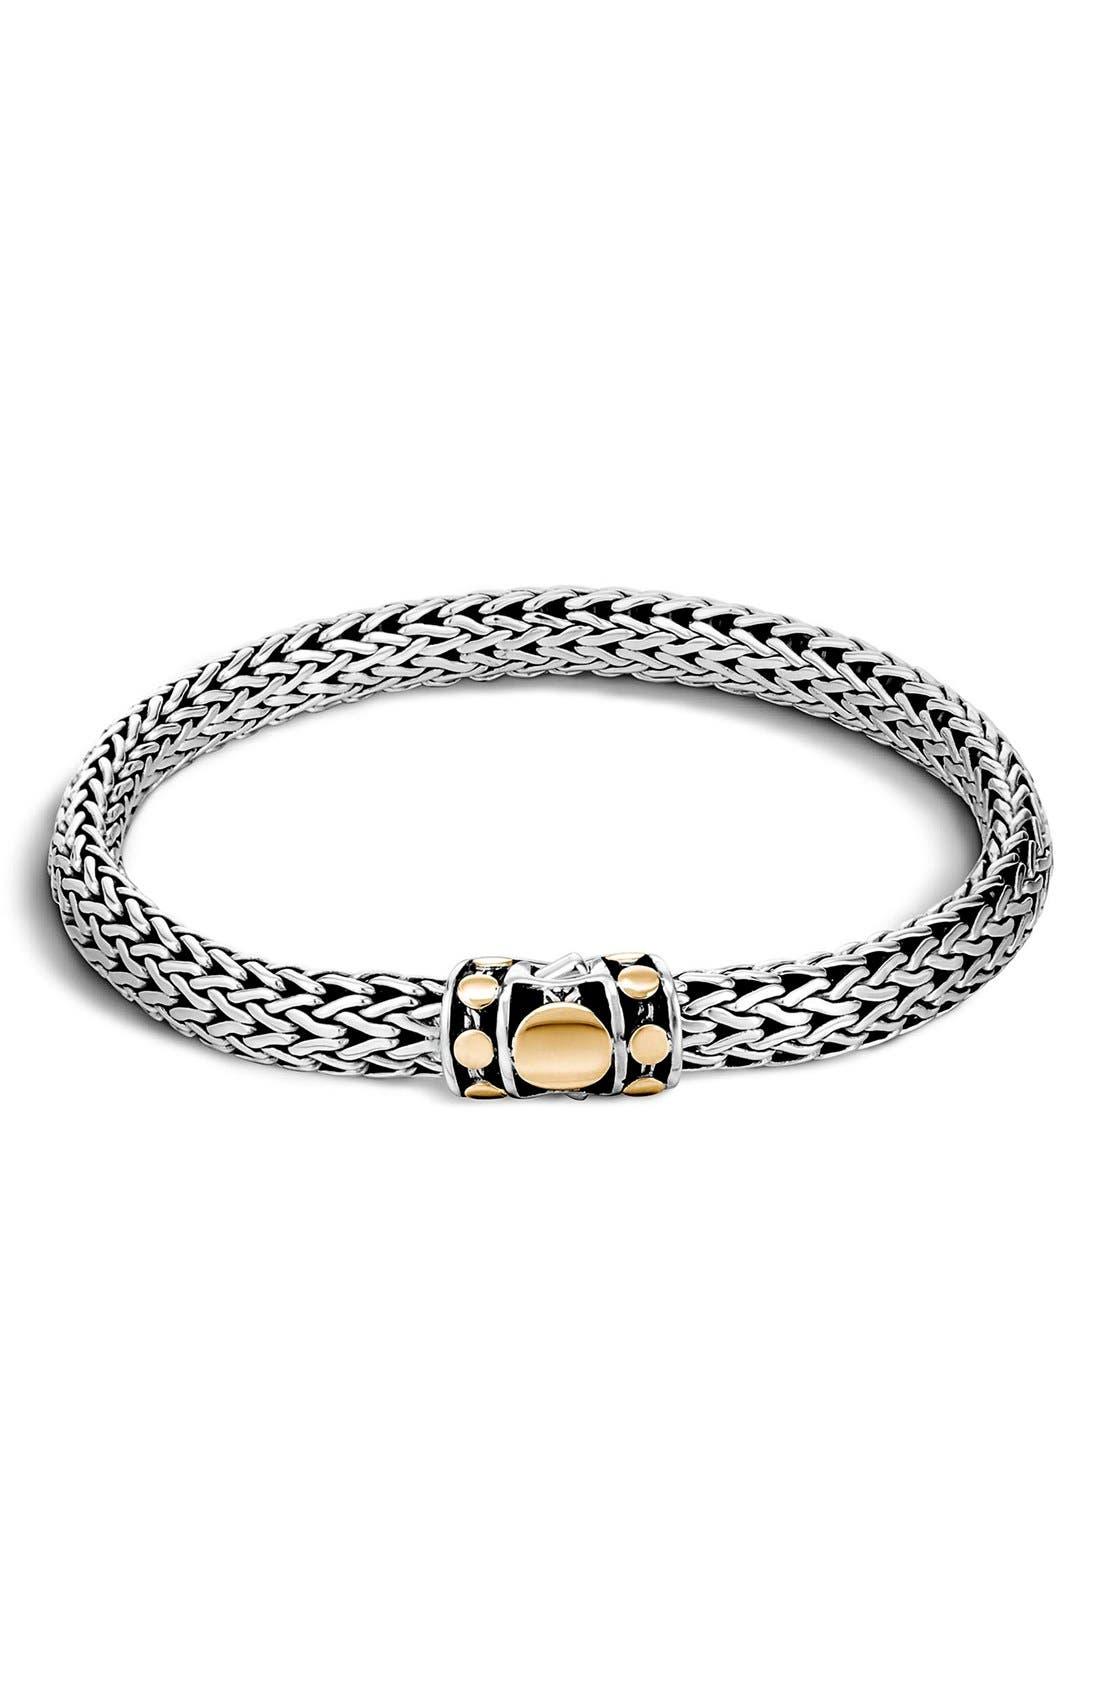 Main Image - John Hardy Dot 6.5mm Bracelet